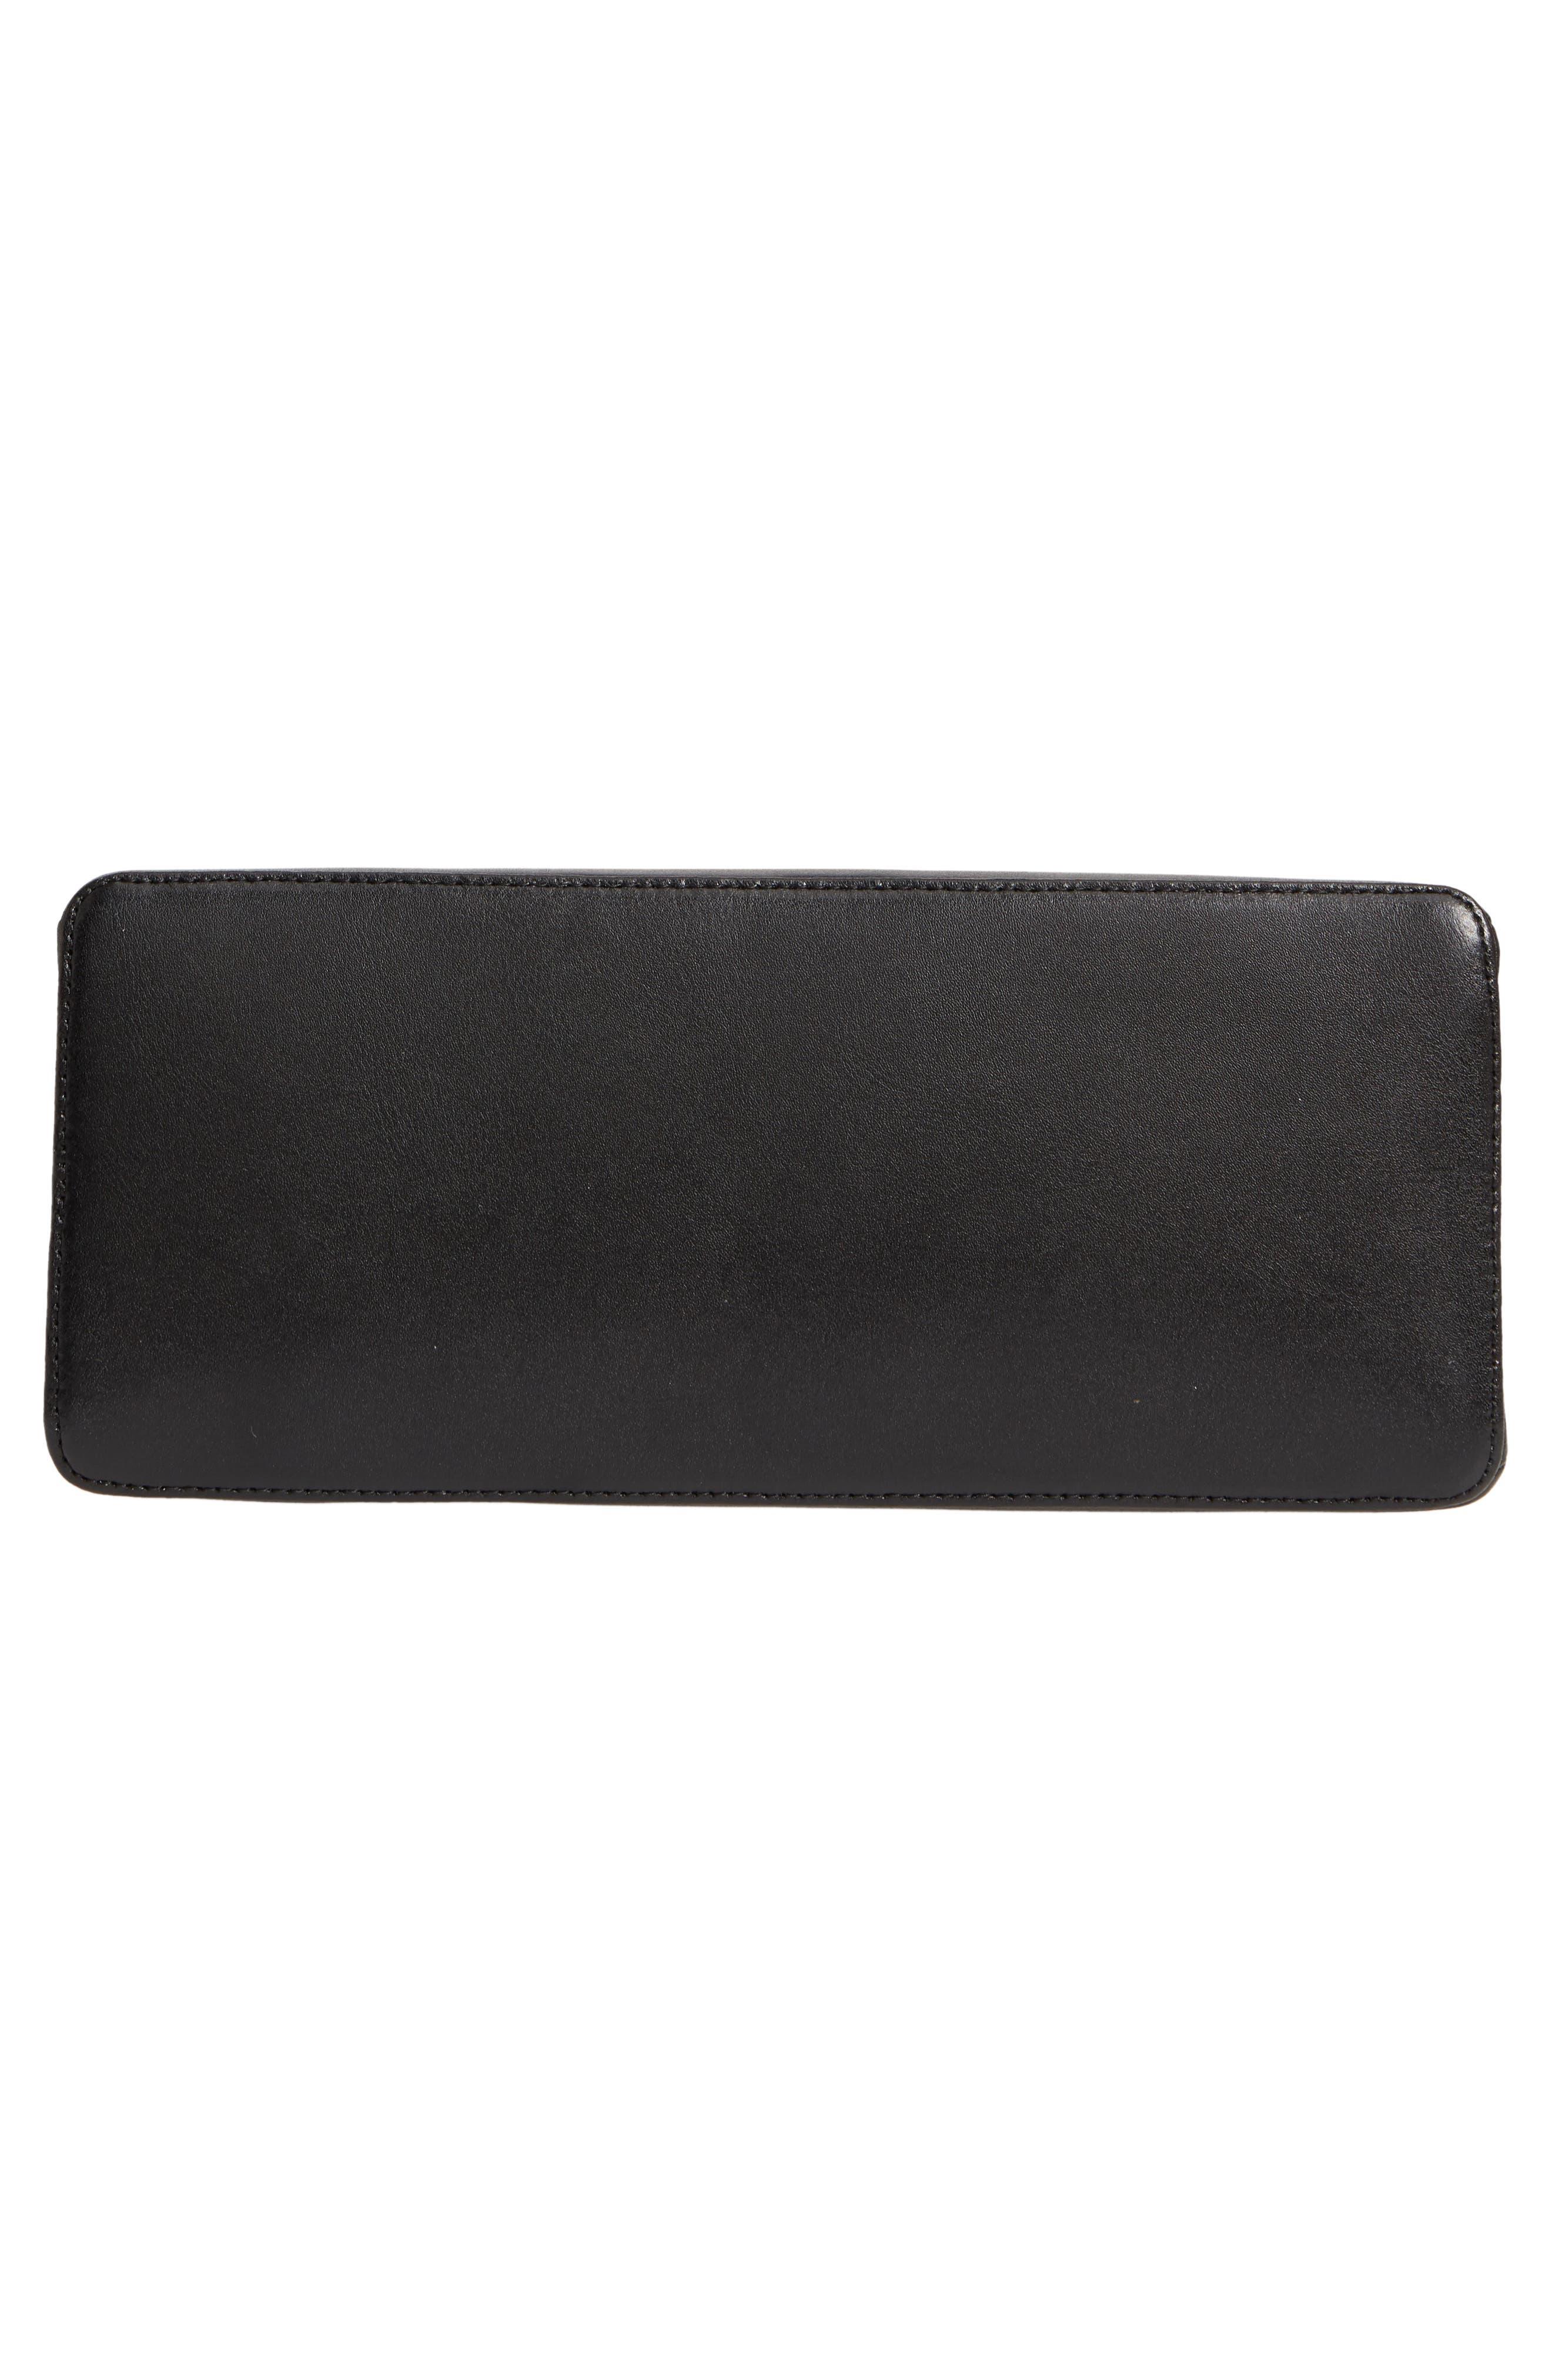 Crystal Bar Leather Top Handle Satchel,                             Alternate thumbnail 6, color,                             001